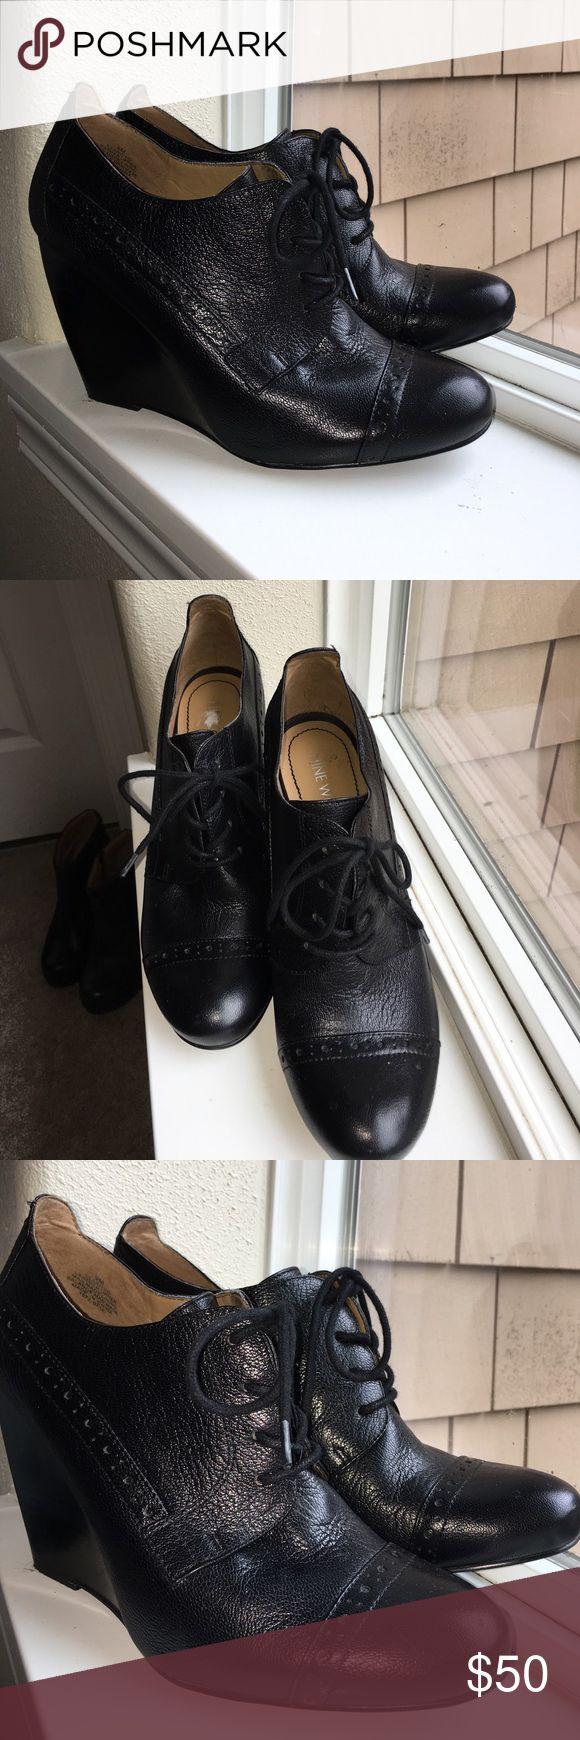 Selling this Nine West Leather Brogue Booties Sz. 9 Trendy! on Poshmark! My username is: gloris_grimm. #shopmycloset #poshmark #fashion #shopping #style #forsale #Nine West #Shoes